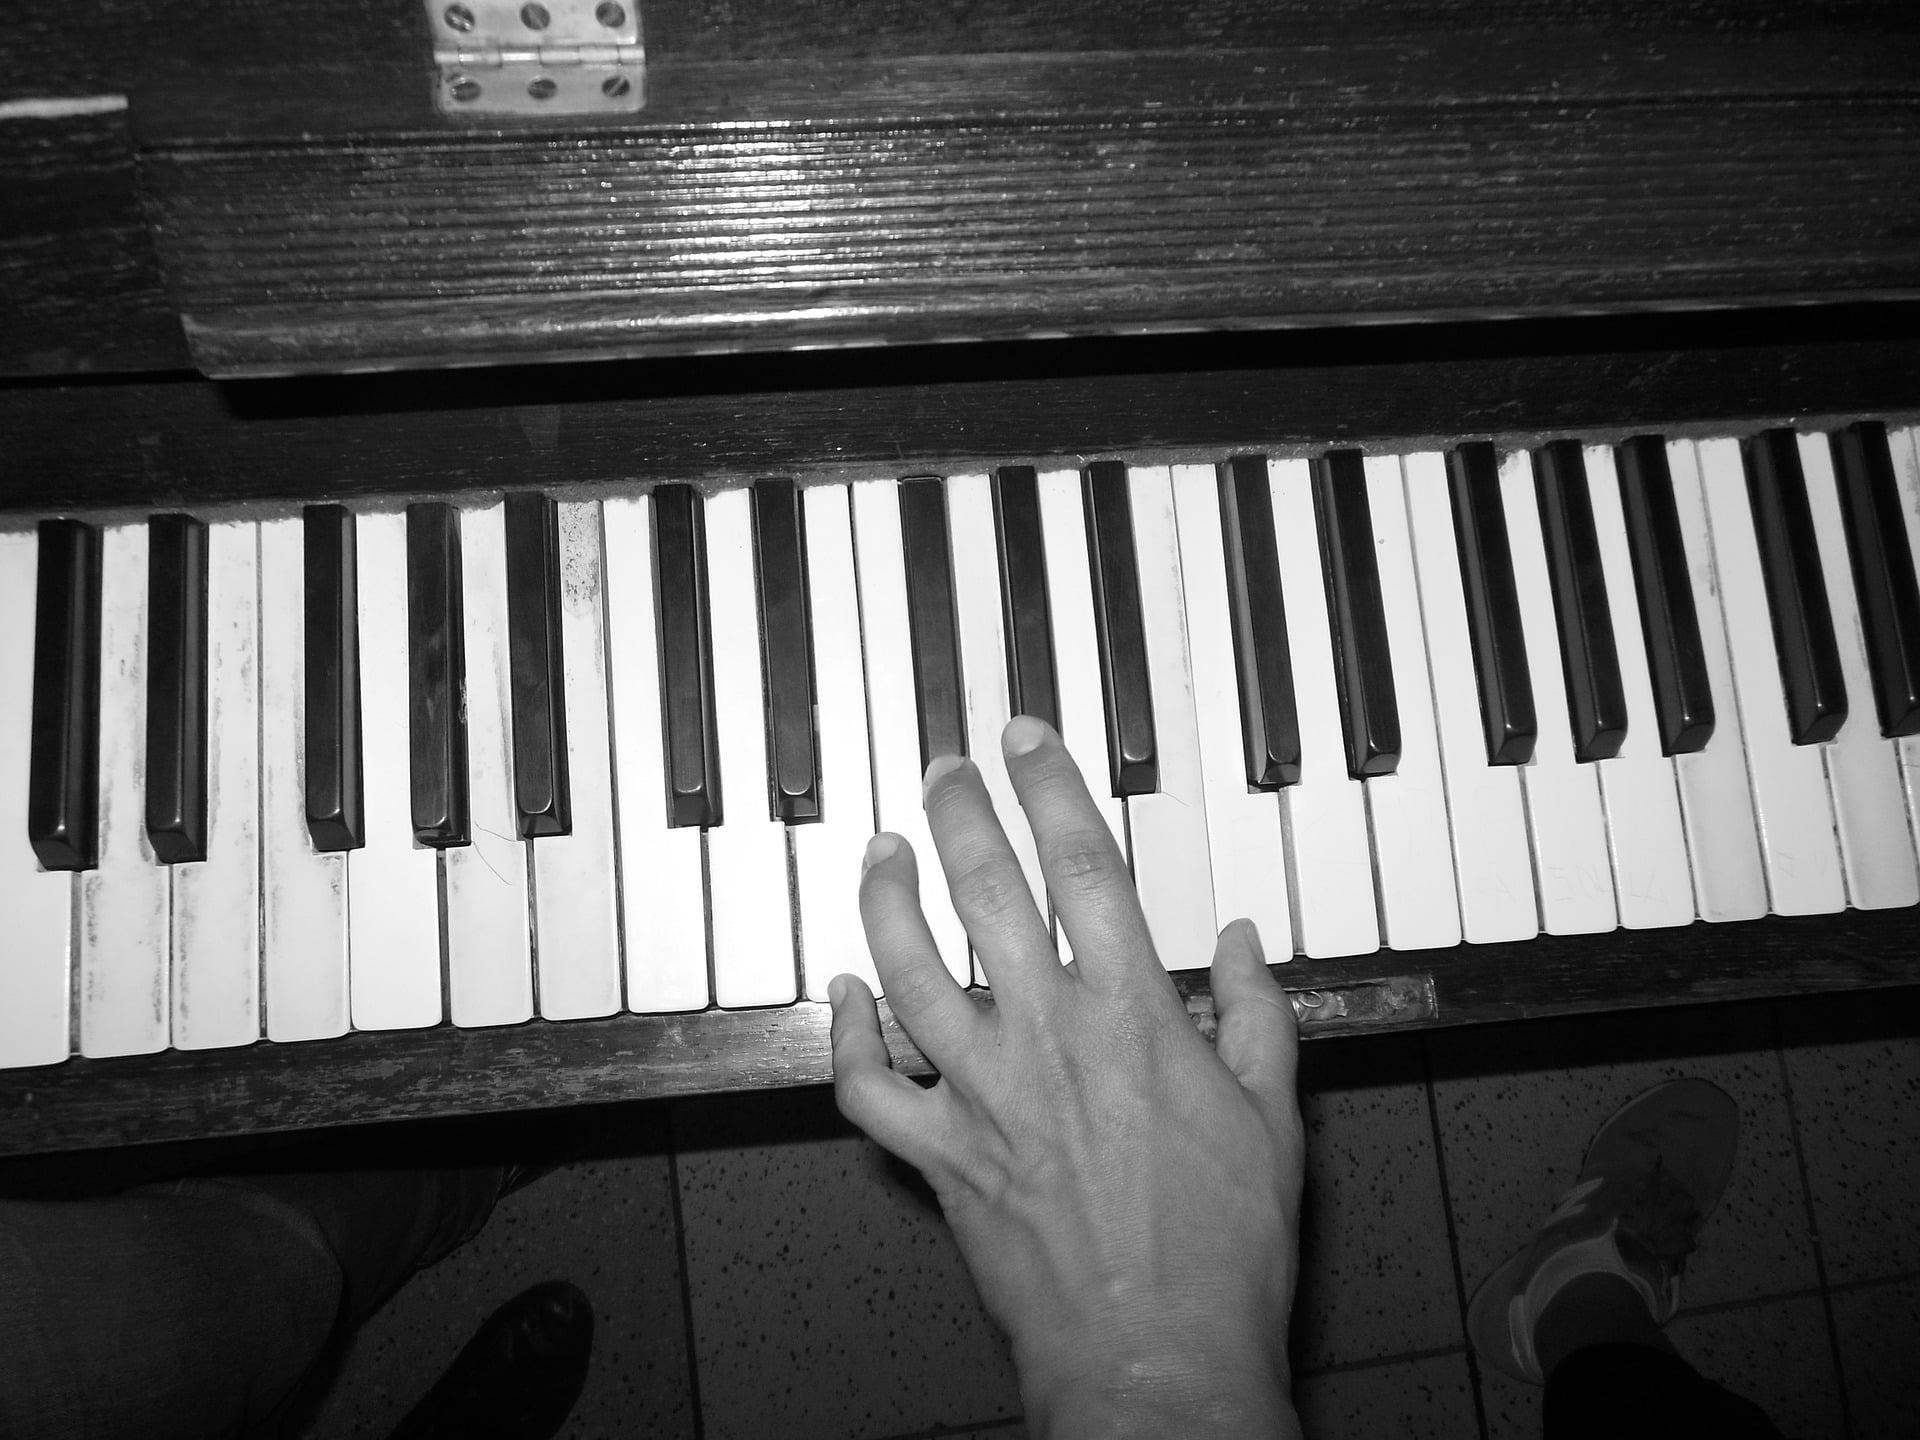 Klasa towarowa (klasa usługowa) - klasa nr 15 (na zdjęciu: pianino)